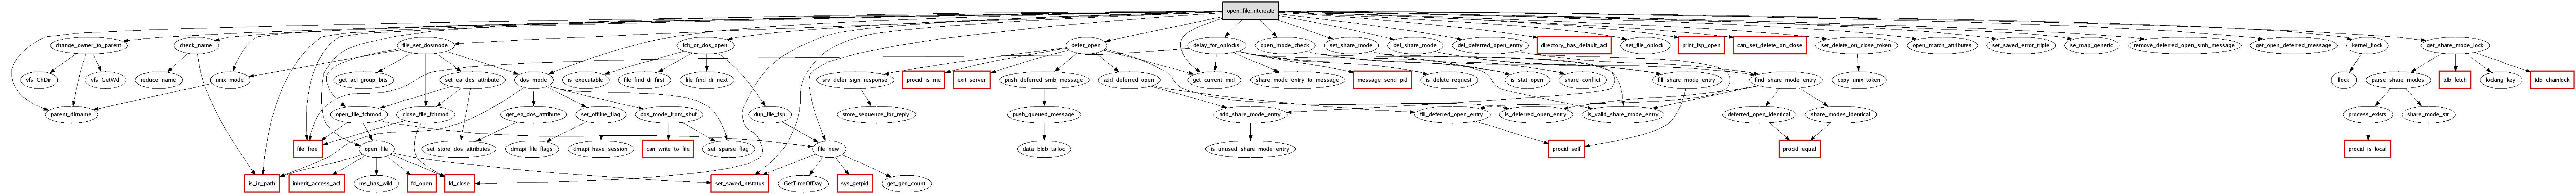 Open file ntcreate.png